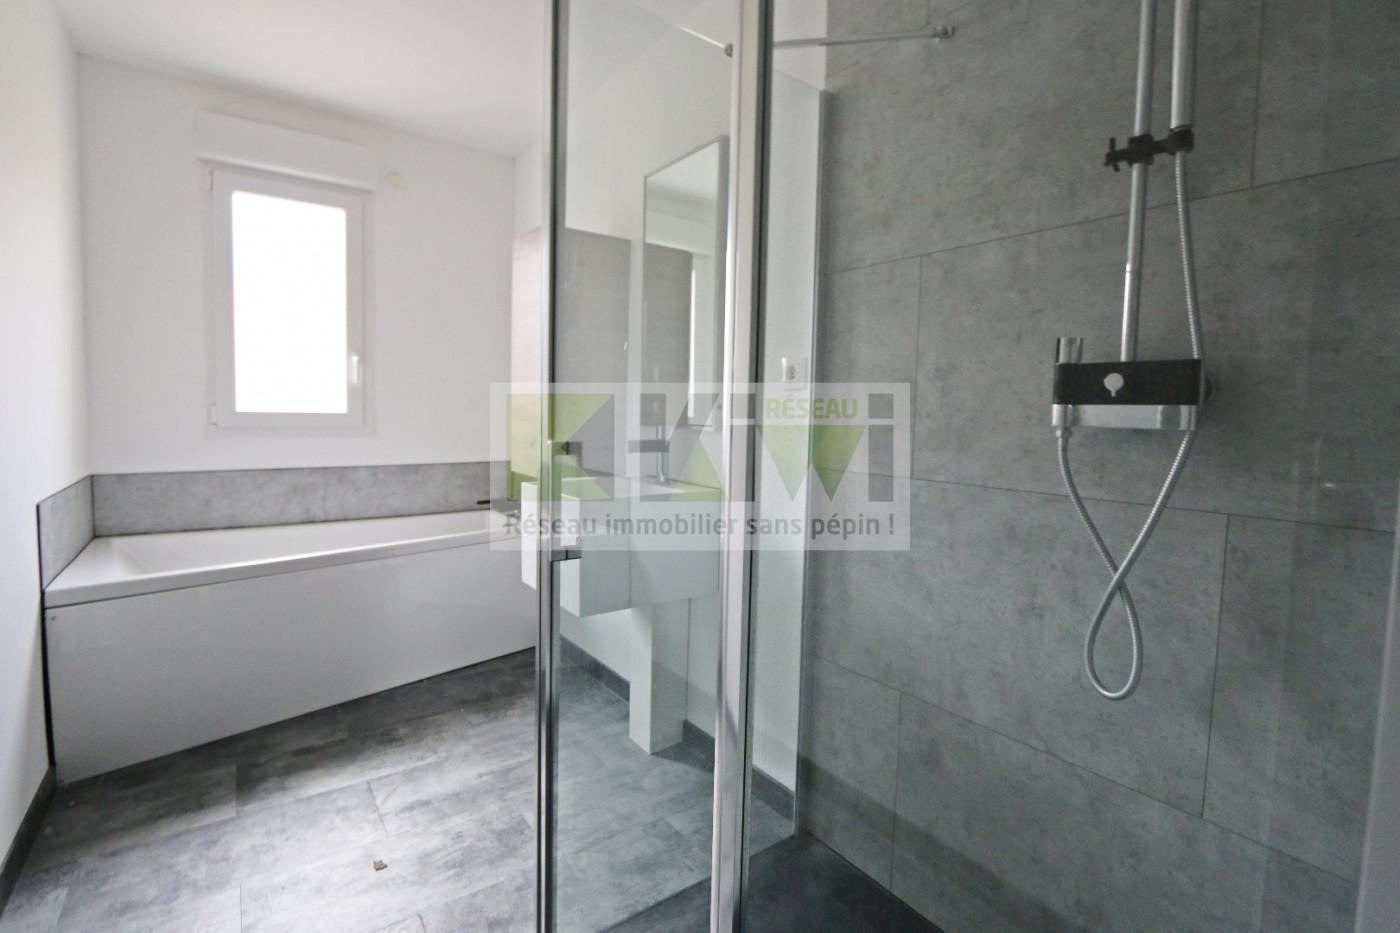 A vendre  Oye Plage | Réf 59013644 - Kiwi immobilier